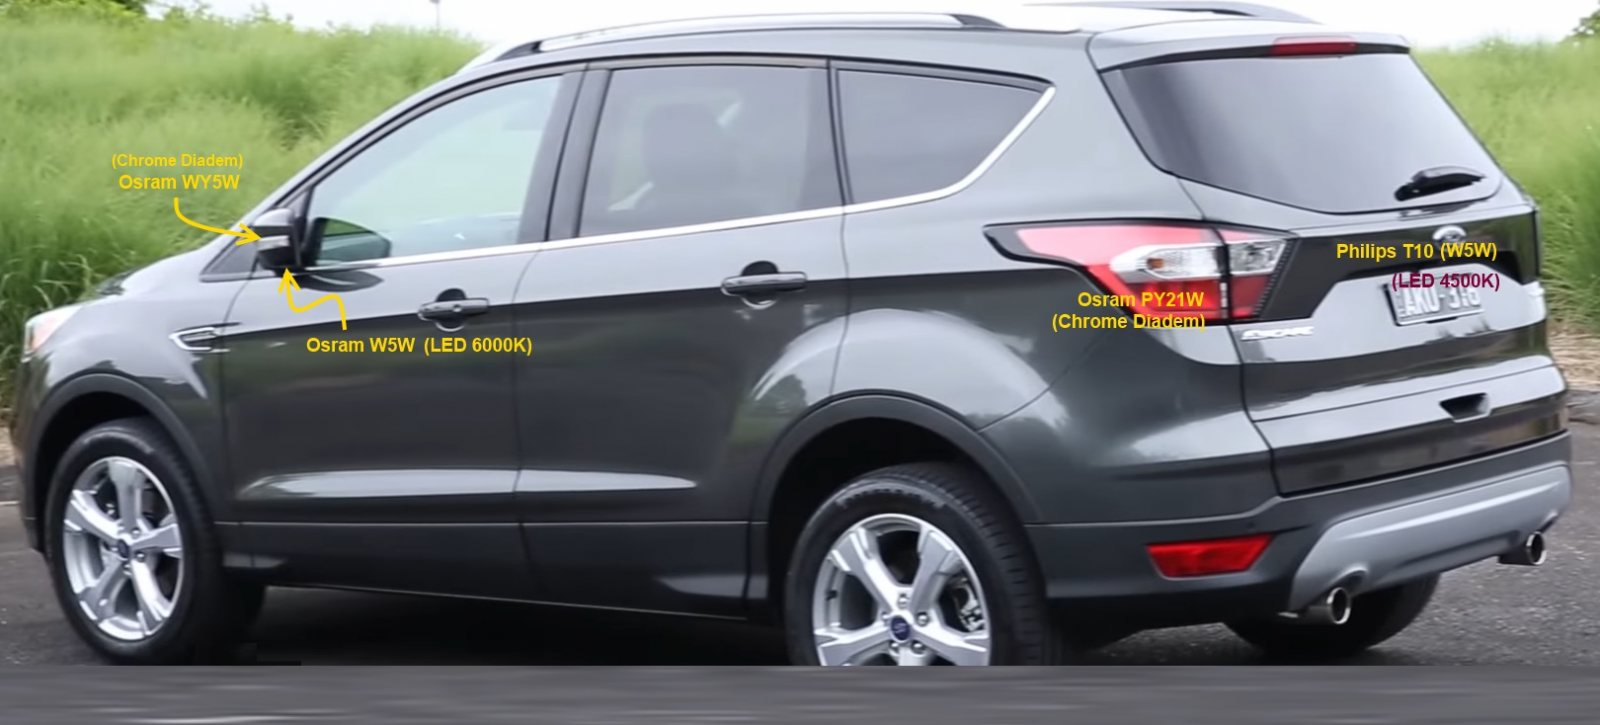 Image Result For Ford Kuga Yorumlar